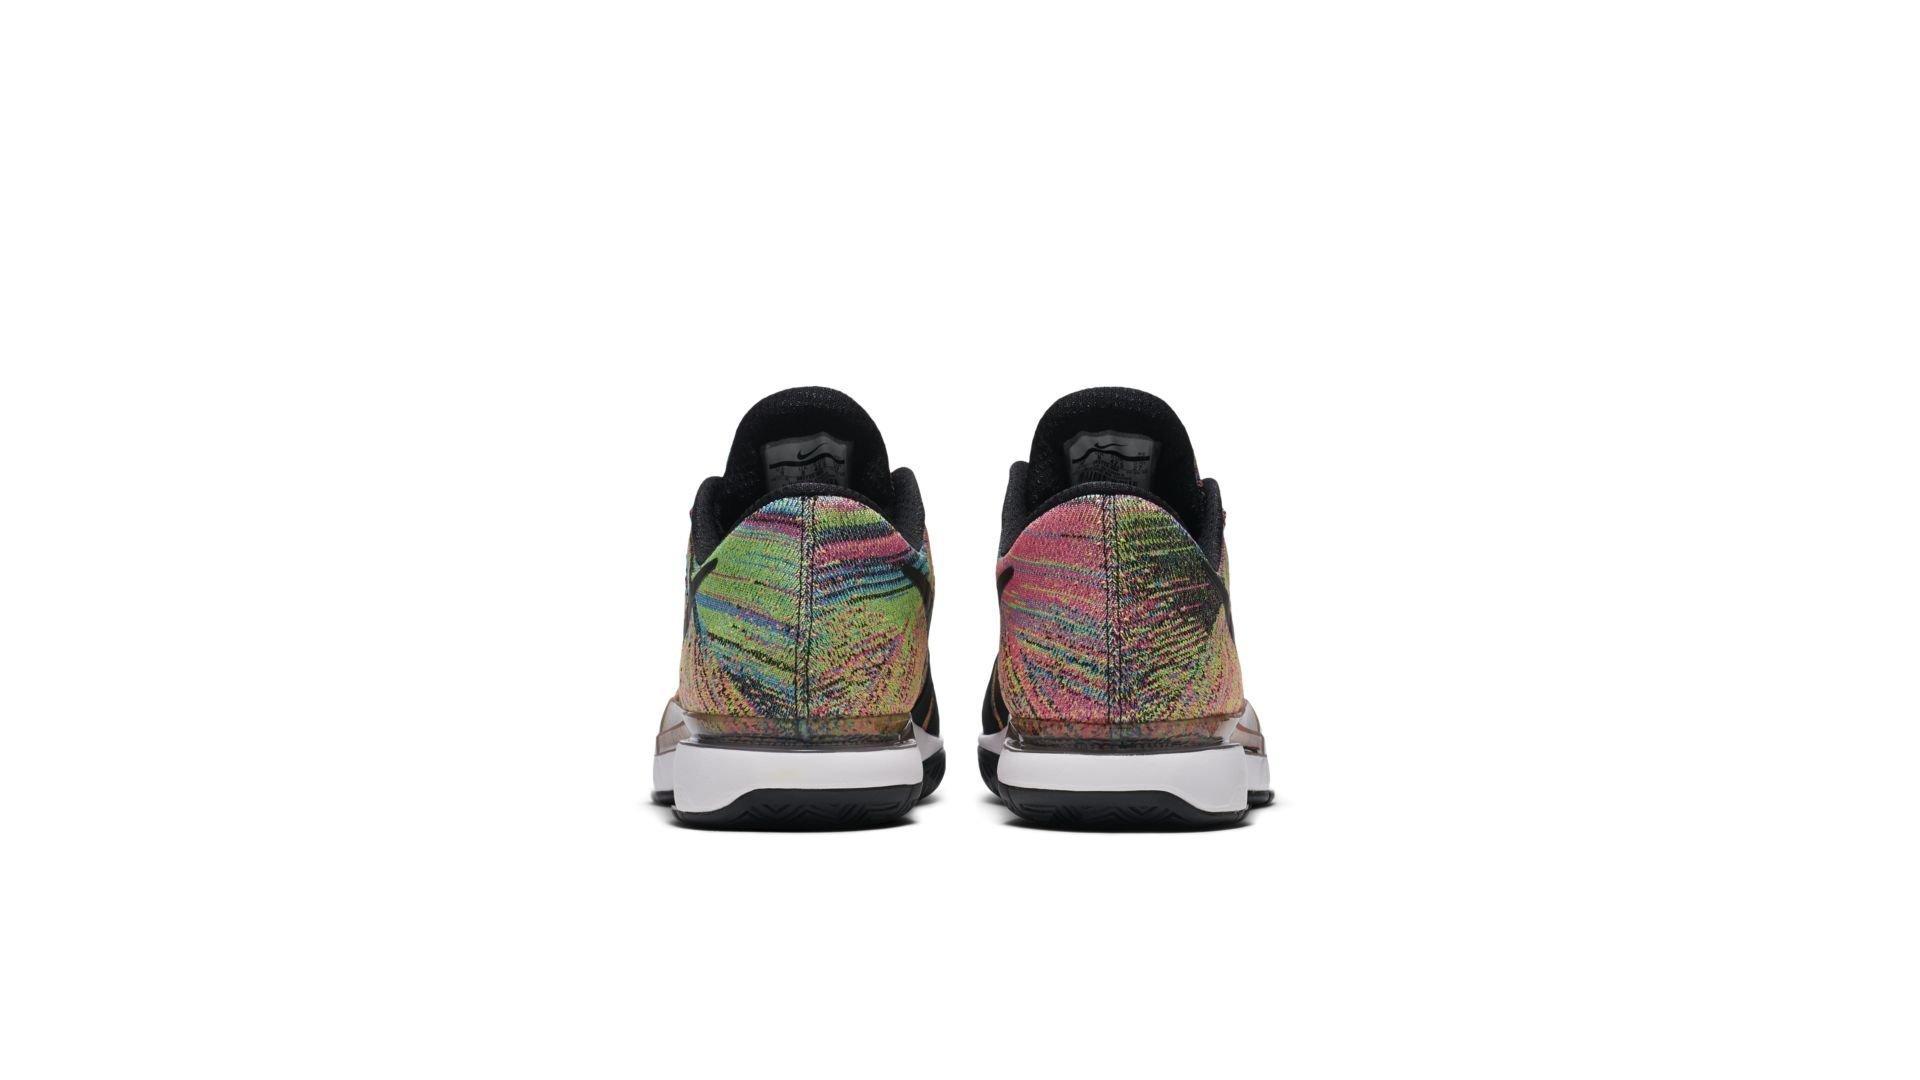 Nike Court Zoom Vapor 9.5 Multi-Color (885725-600)